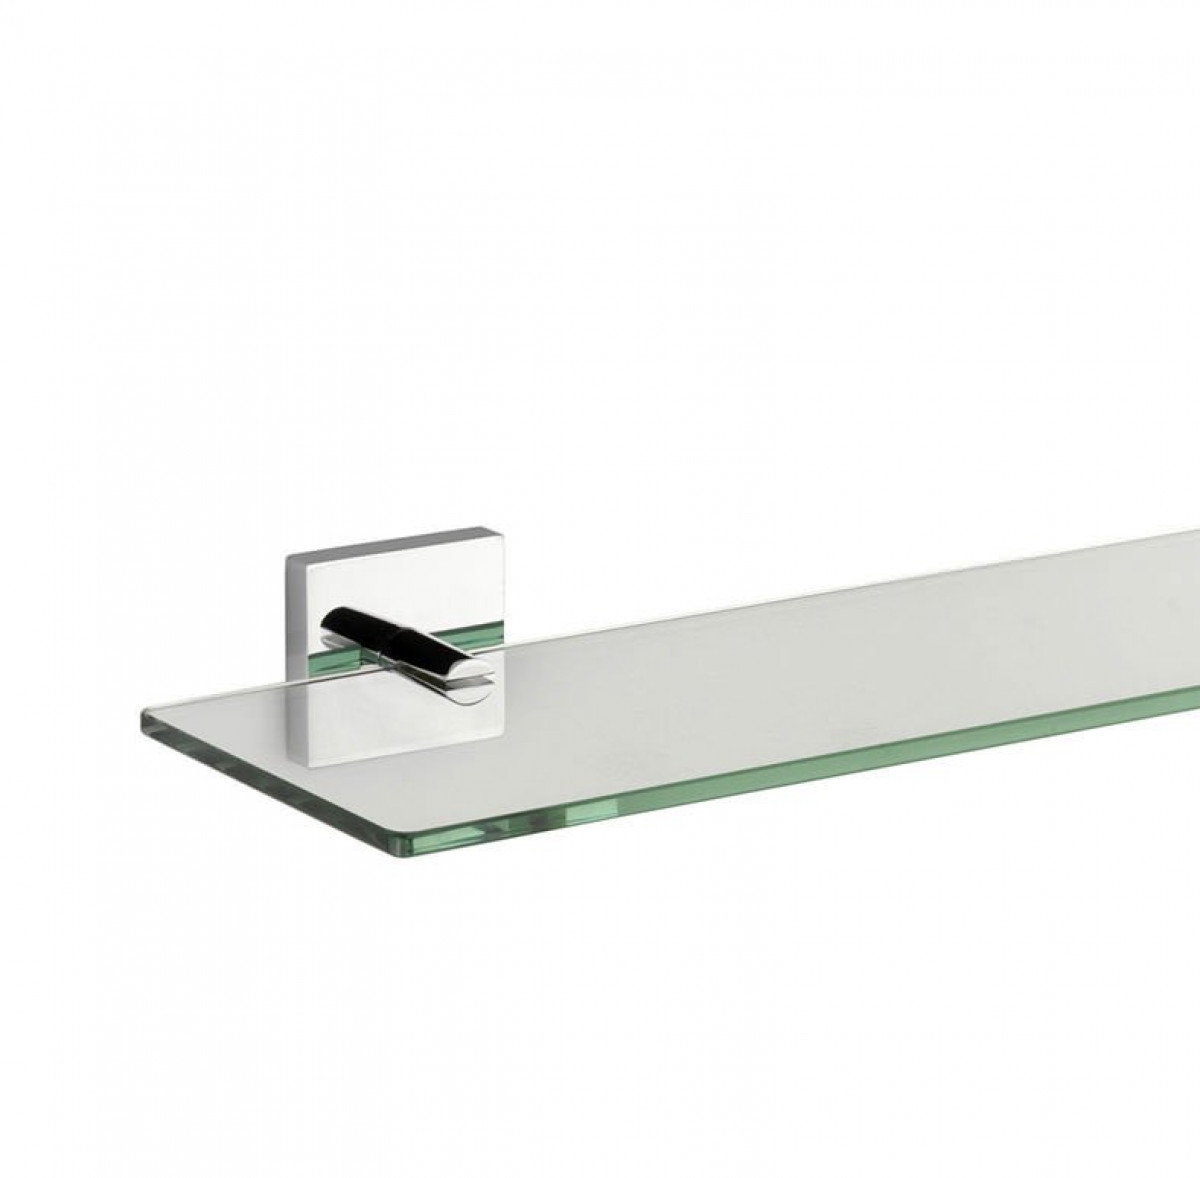 Croydex Flexi Fix Chester Glass Shelf Qm441441